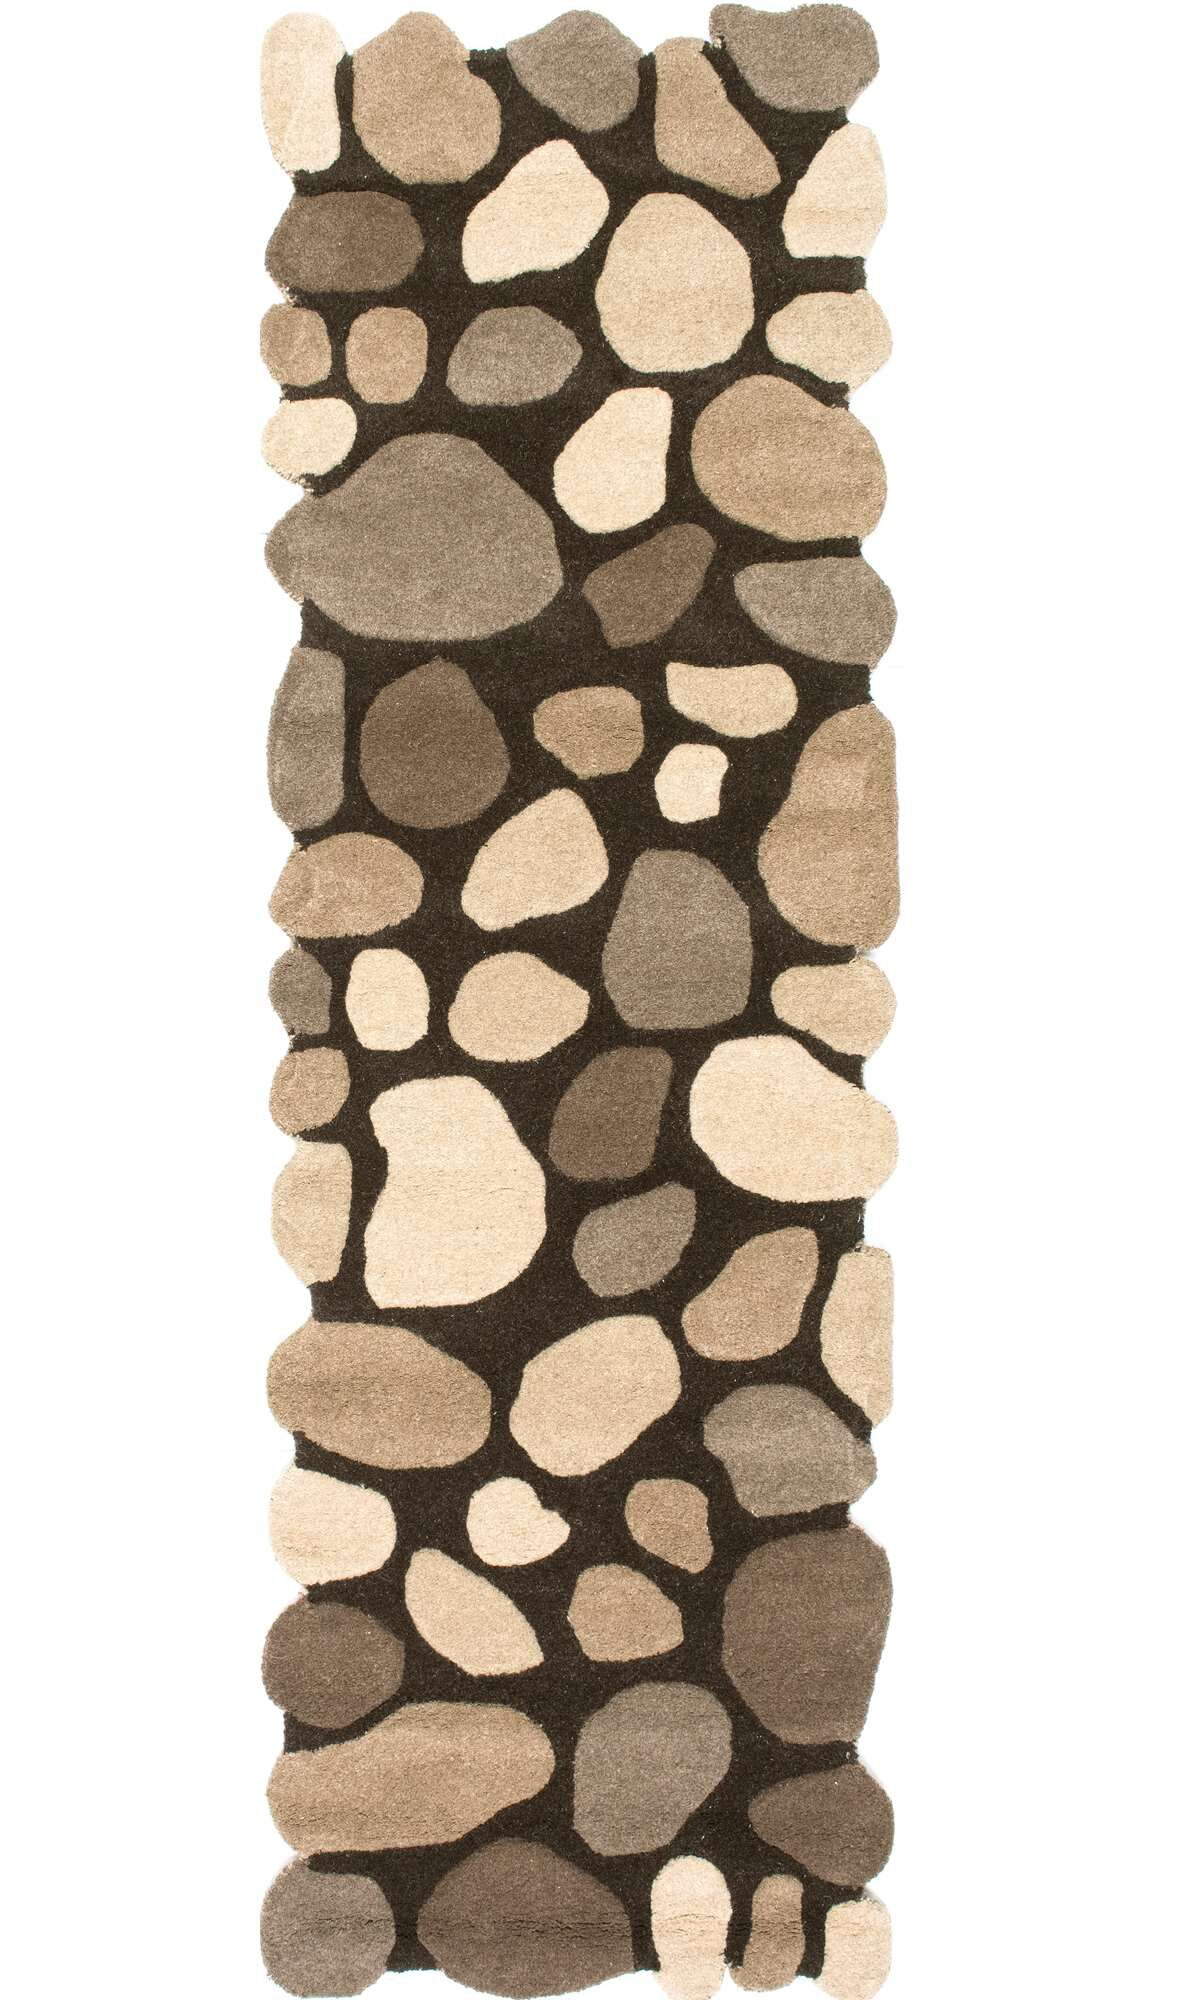 Alpert Pebbles Hand-Tufted Dark Brown Area Rug Rug Size: Runner 2'6